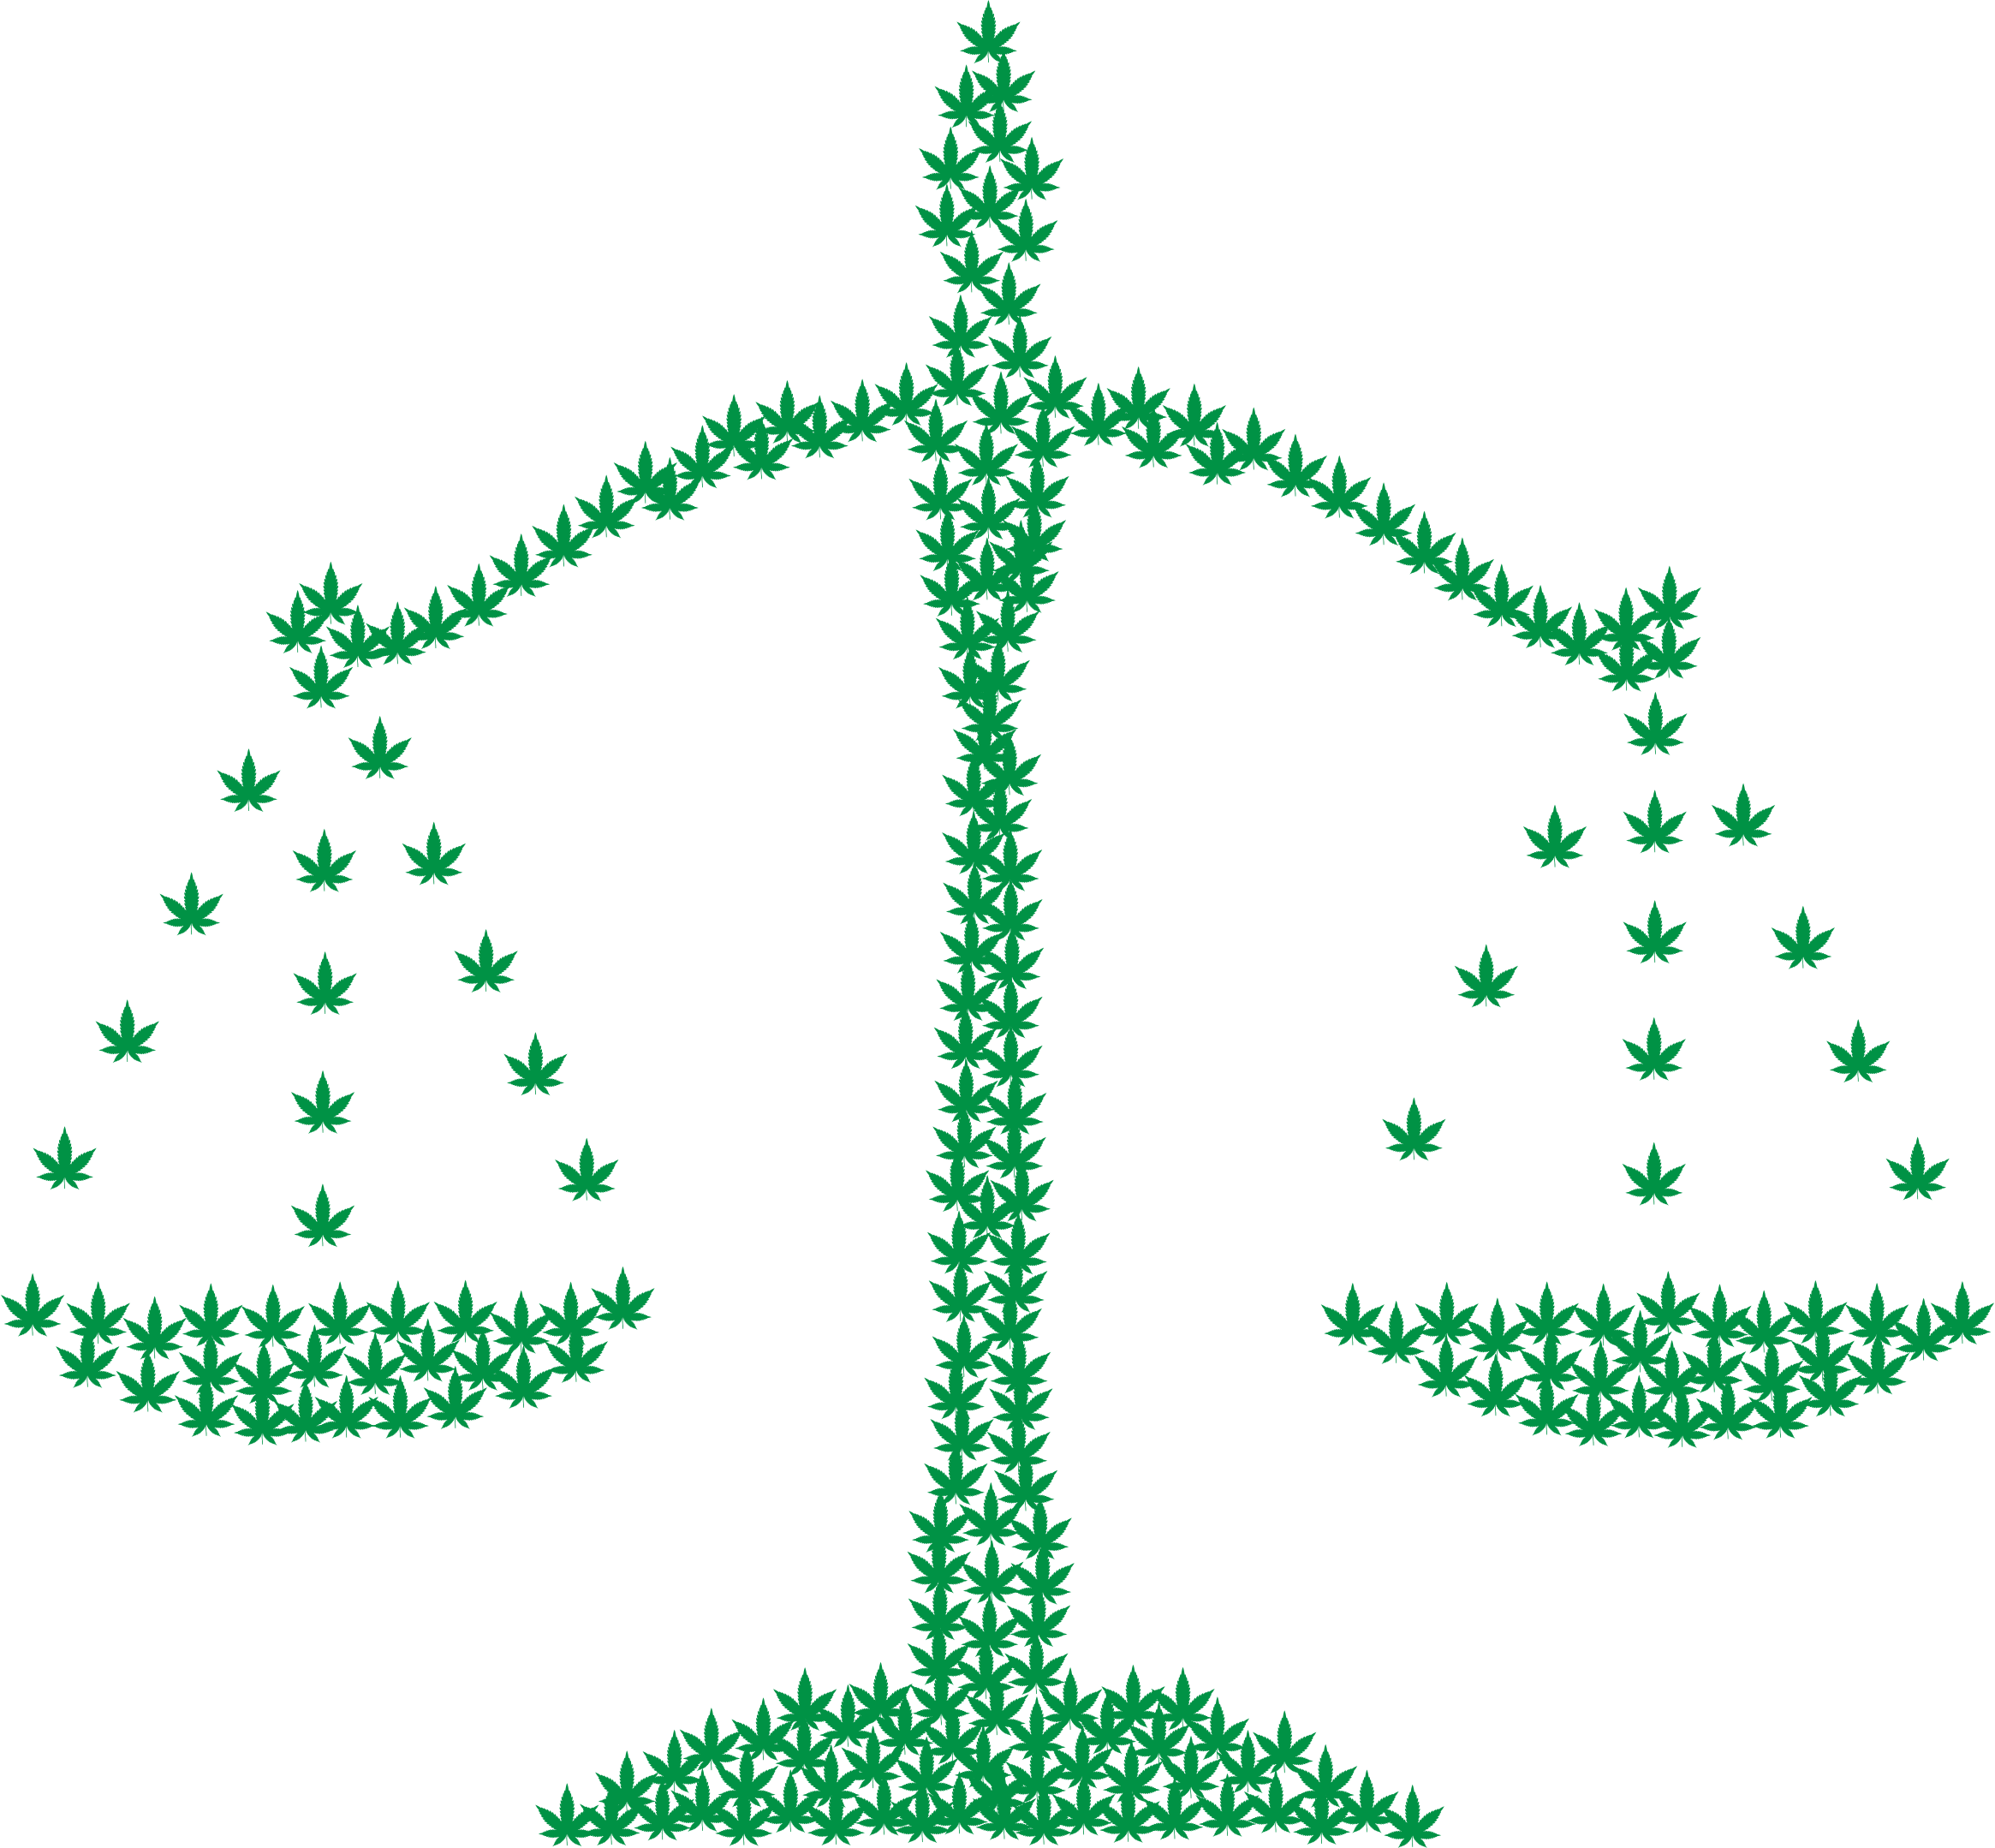 Legalization big image png. Marijuana clipart pdf